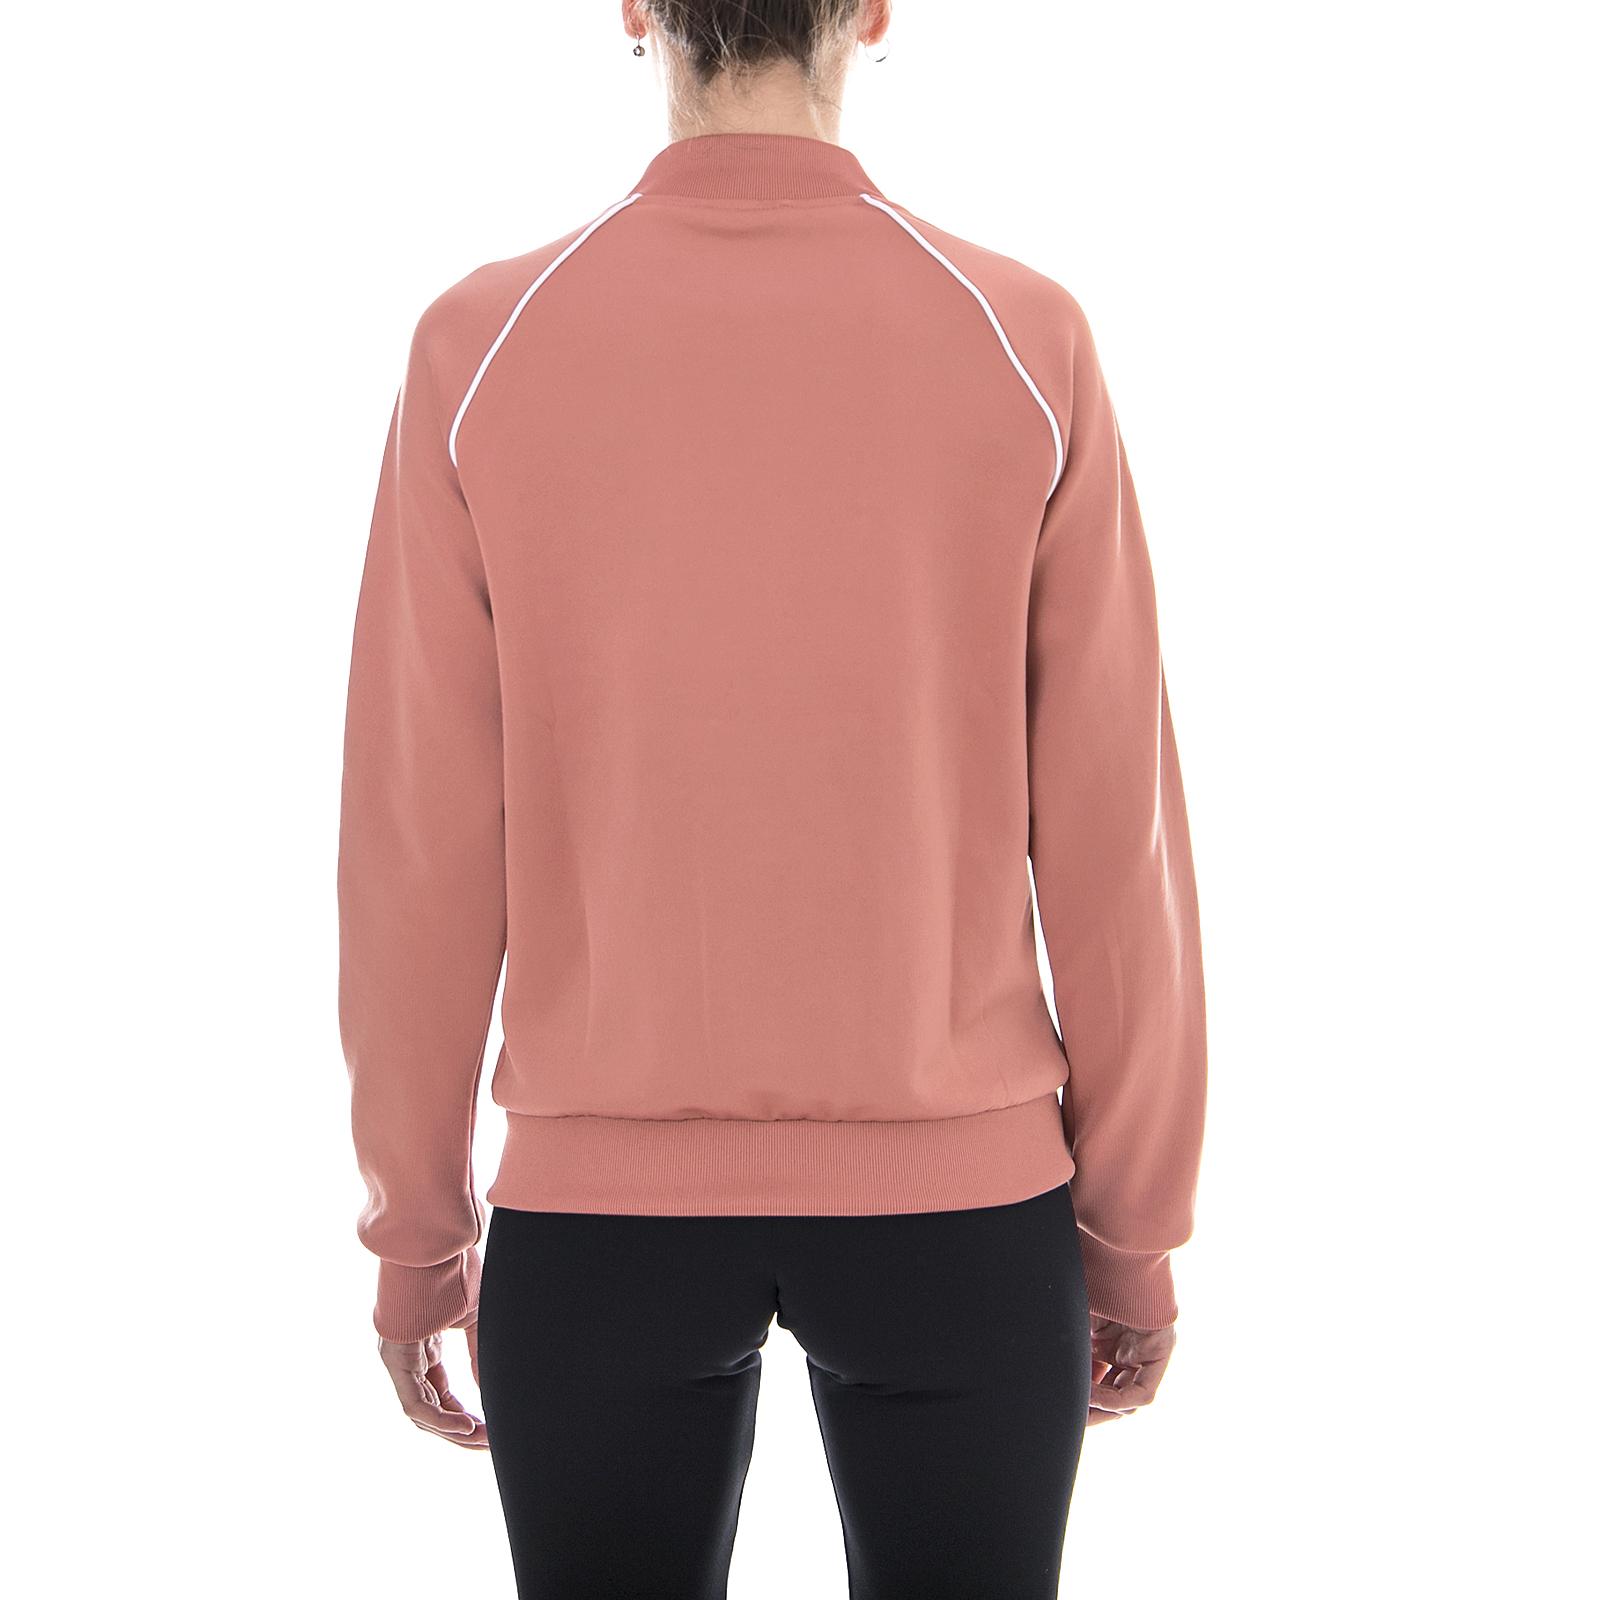 5c69e24780f1c7 Ebay Ash Rosa Jacken Pink Track Adidas Sst Jacke z4WAx0q